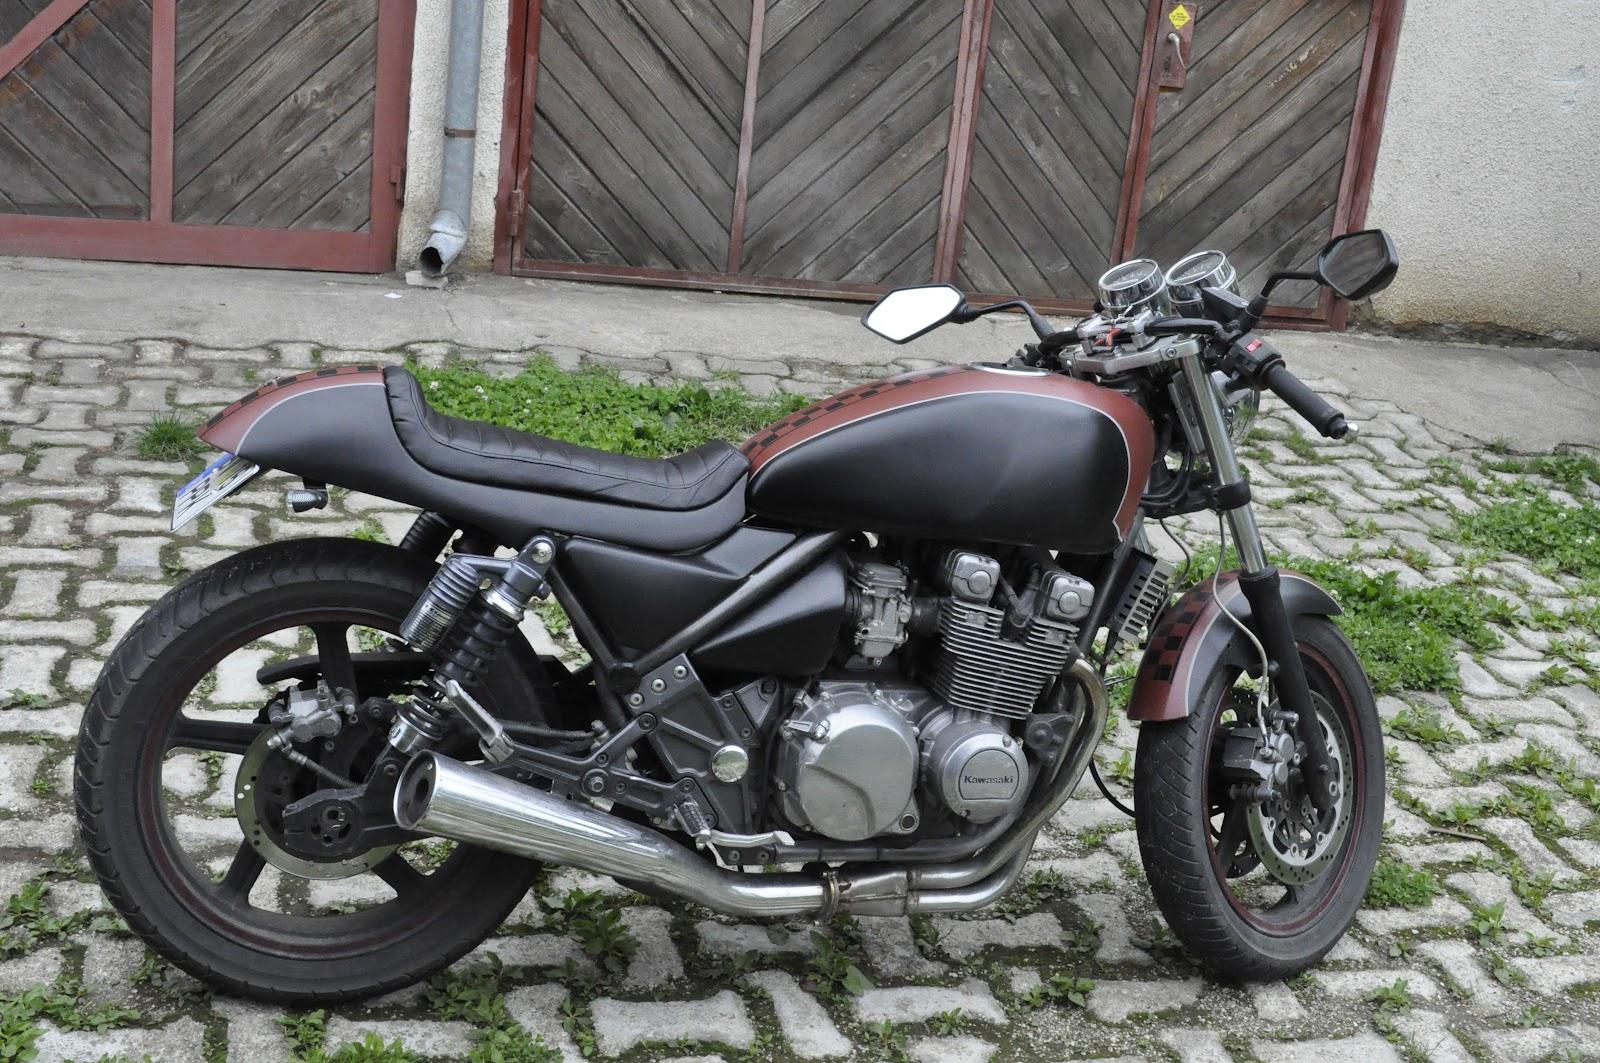 550 zephyr cafra - Page 2 Kawasaki+zephyr+cafe+racer+custom+Bastybikes